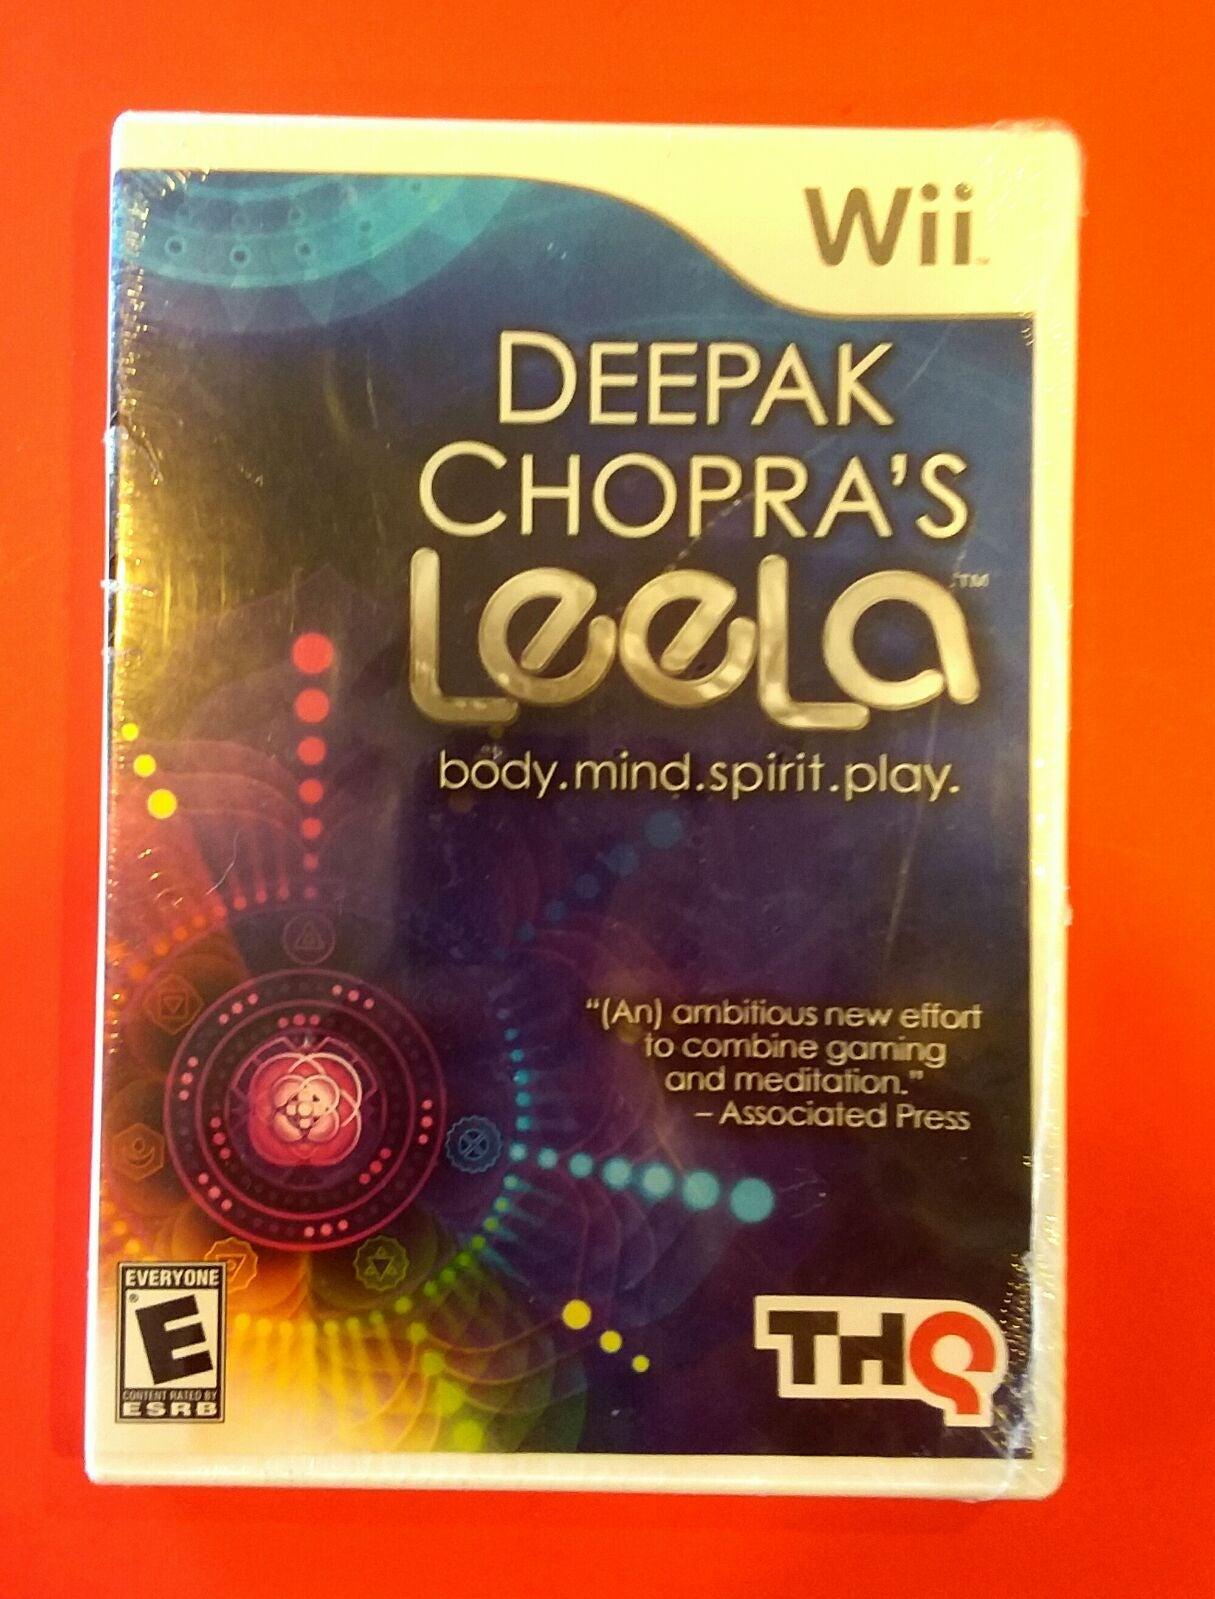 *New Wii Deepak Chopra's Leela